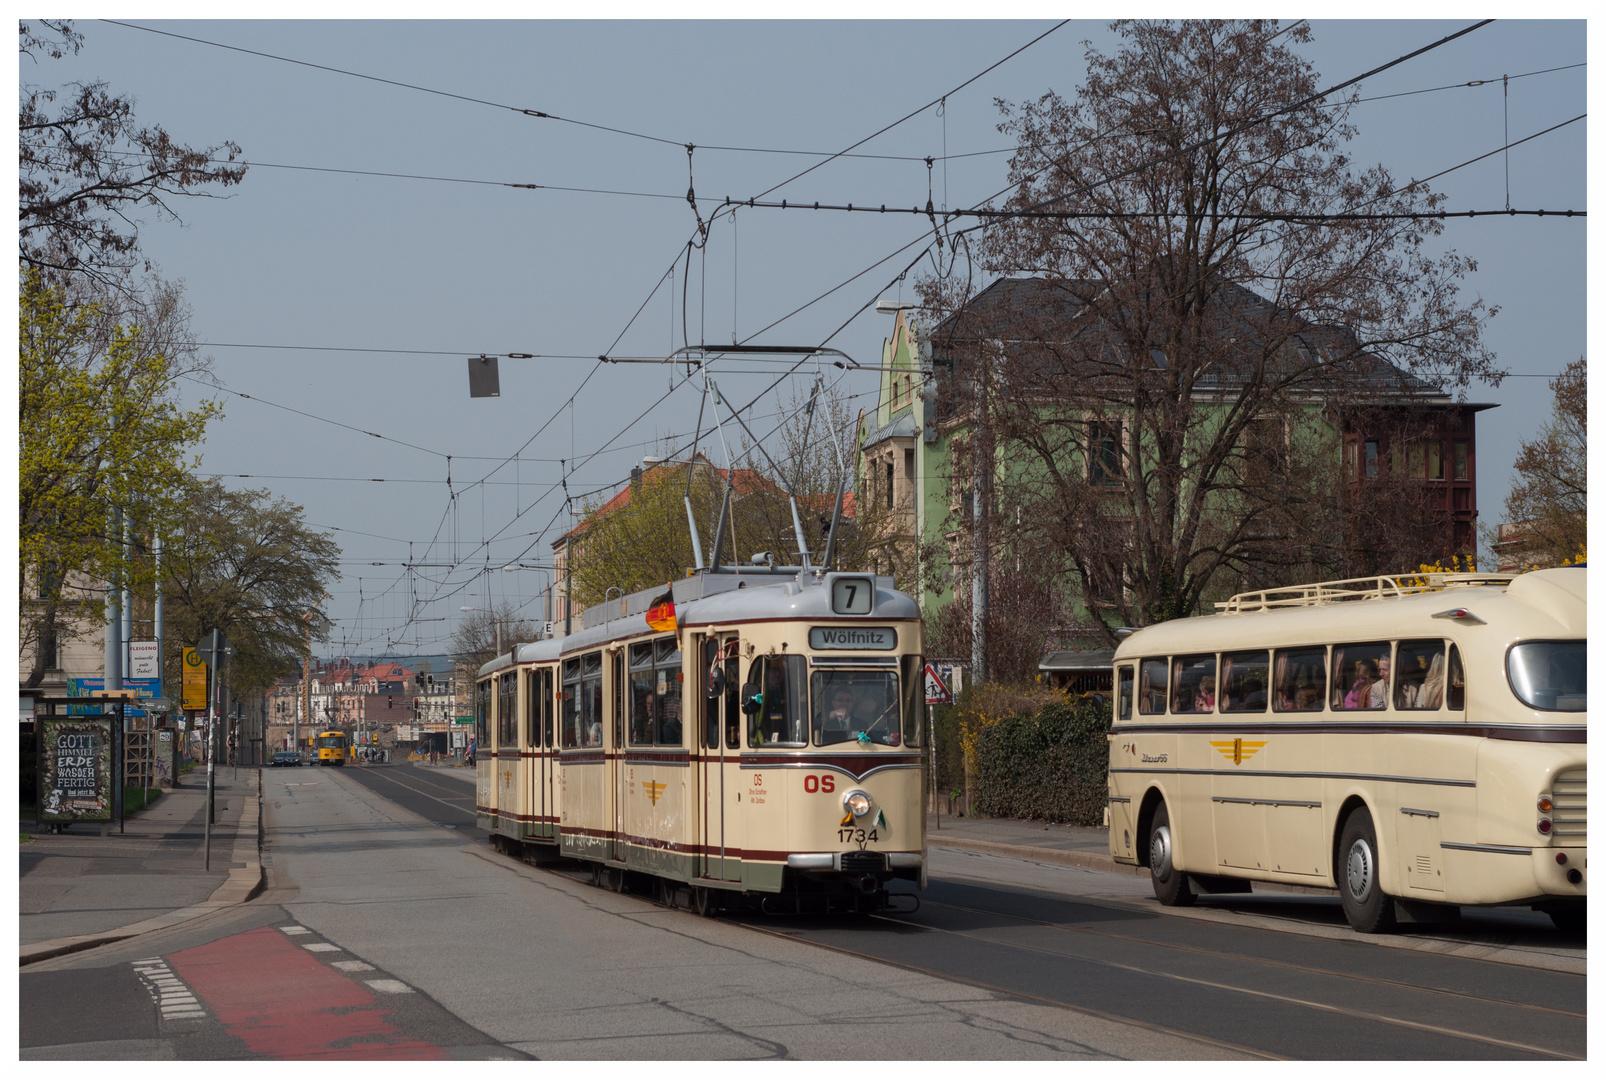 Straßenbahn trifft Bus